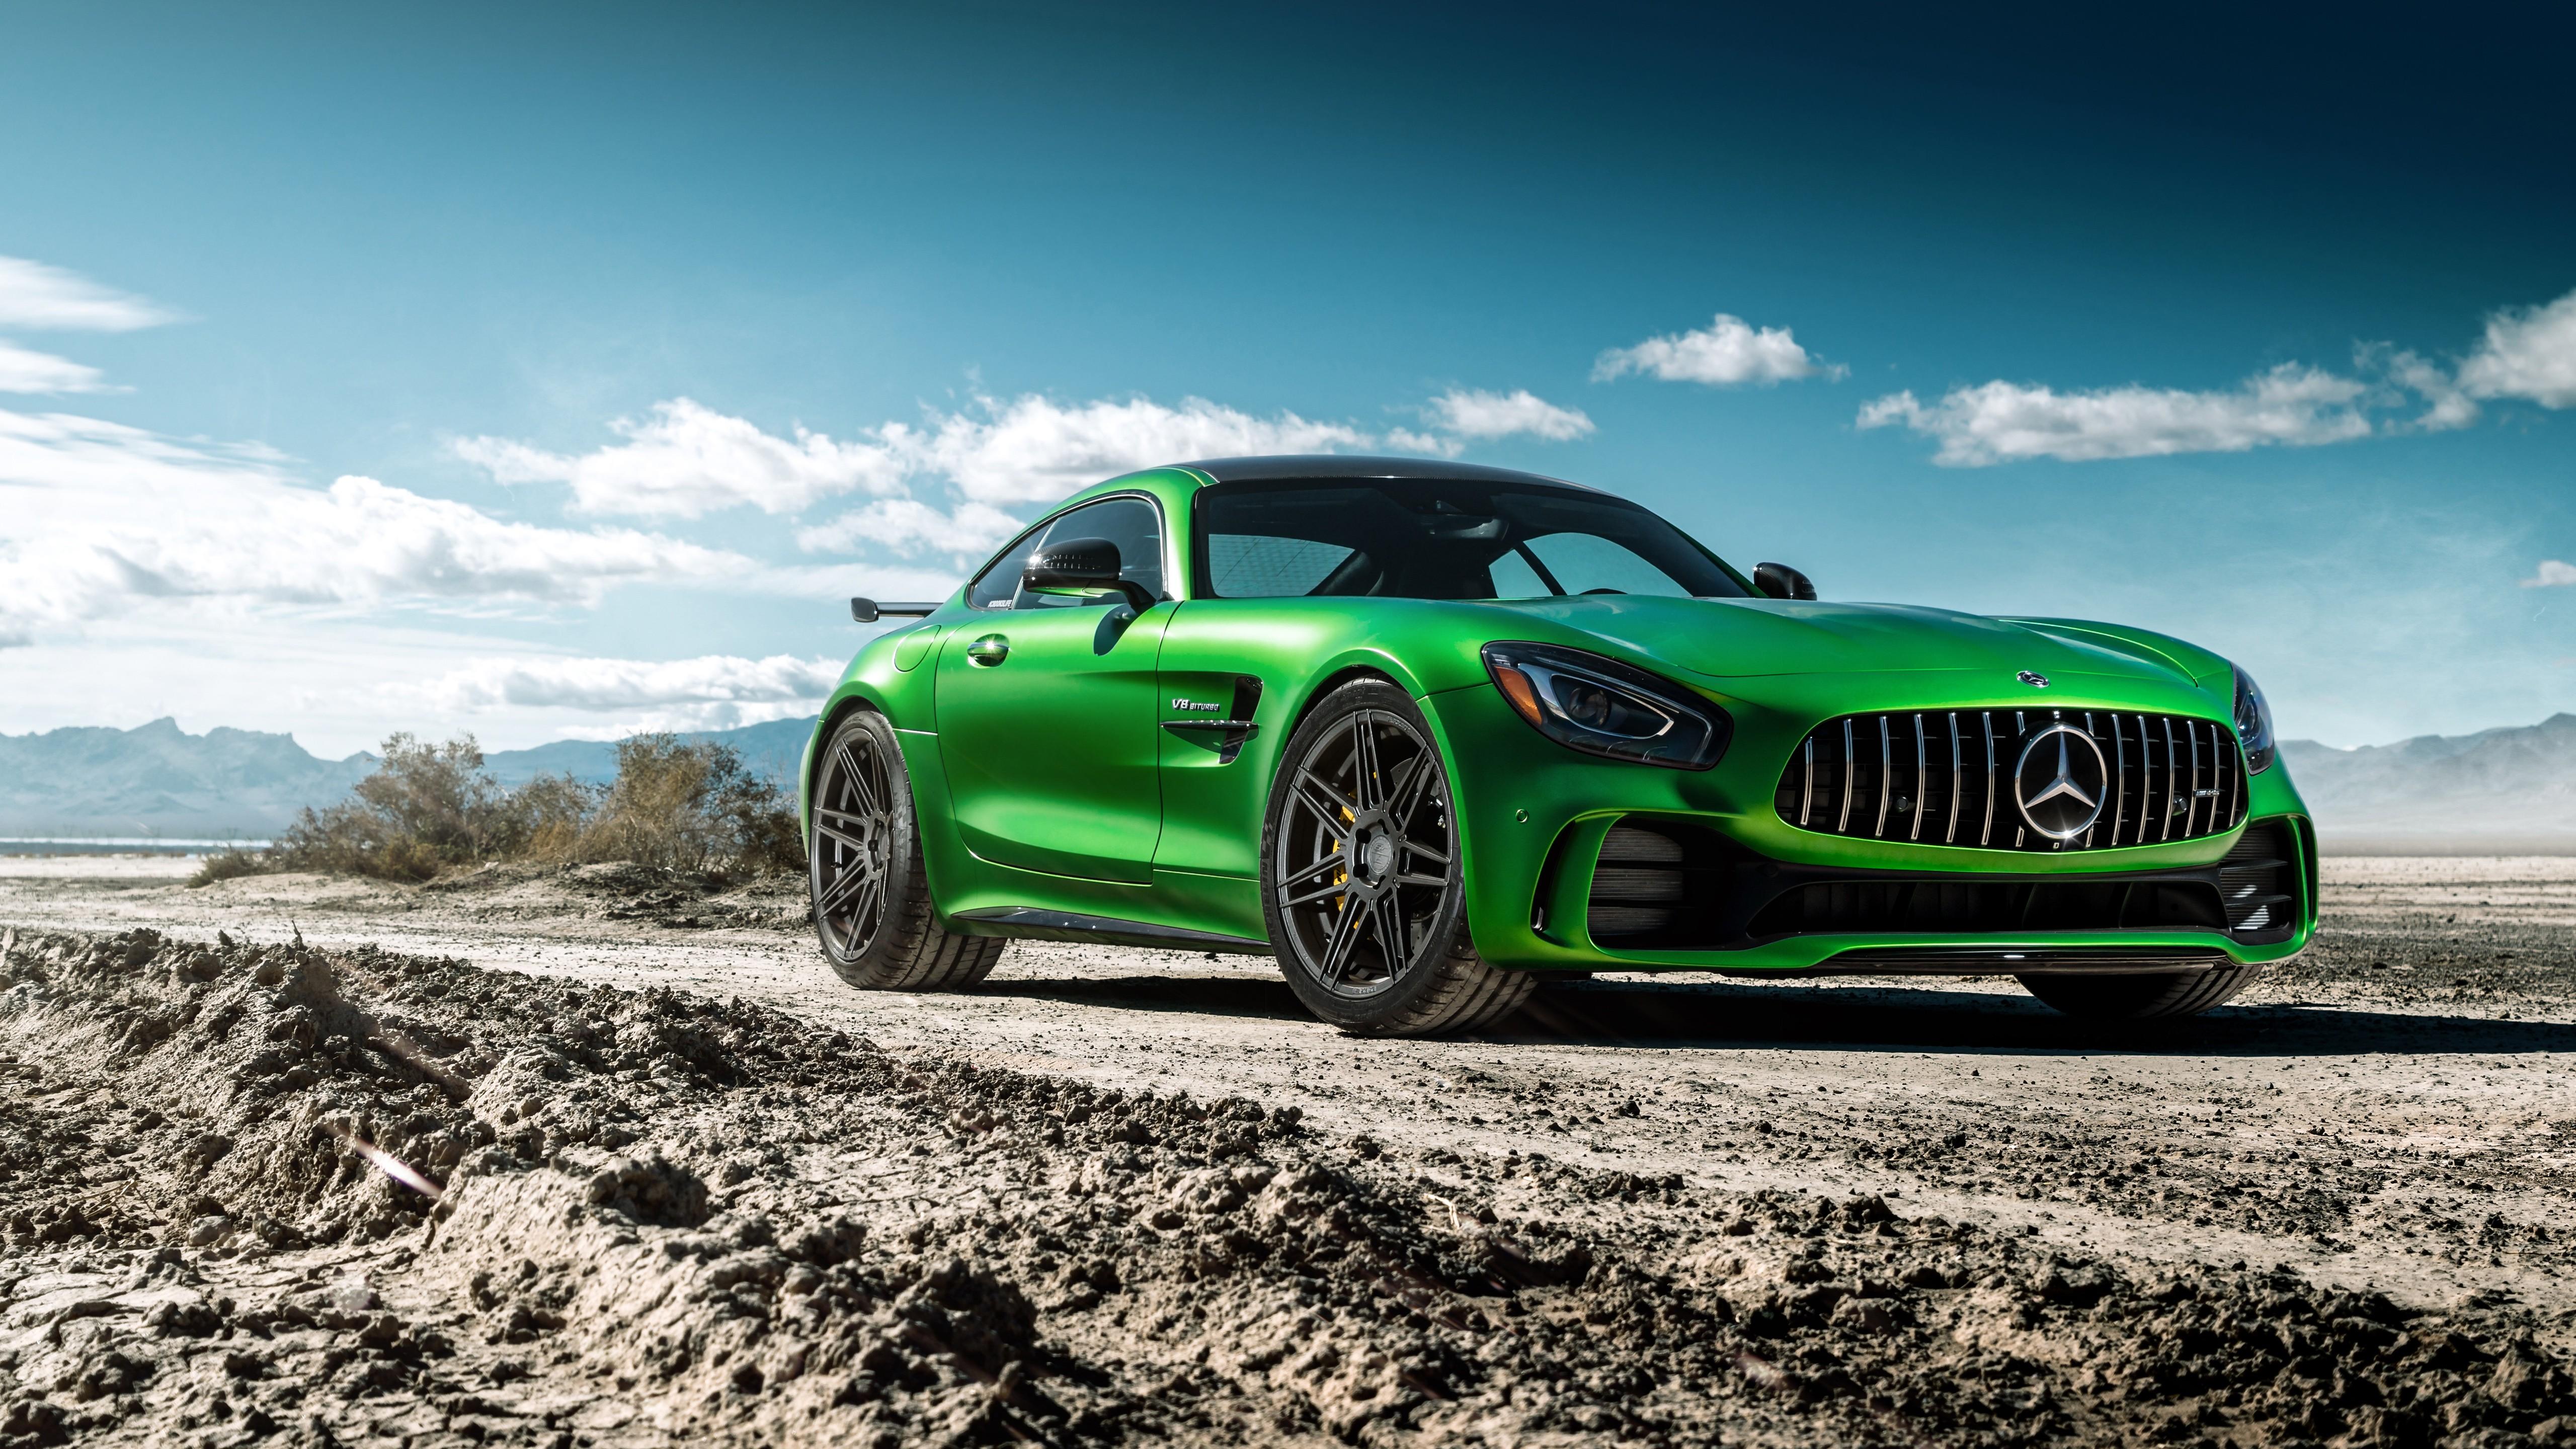 Mercedes F 015 >> Ferrada Sema Green Mercedes GTR 5K Wallpaper | HD Car Wallpapers | ID #9491